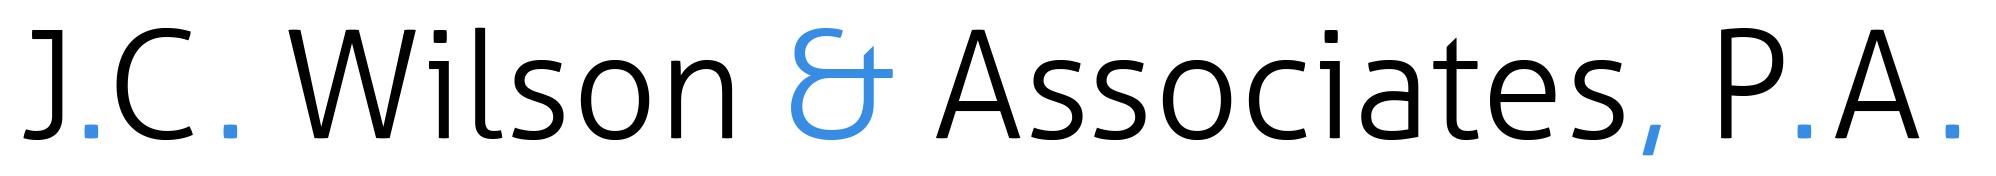 WIlson and Associates P.A.